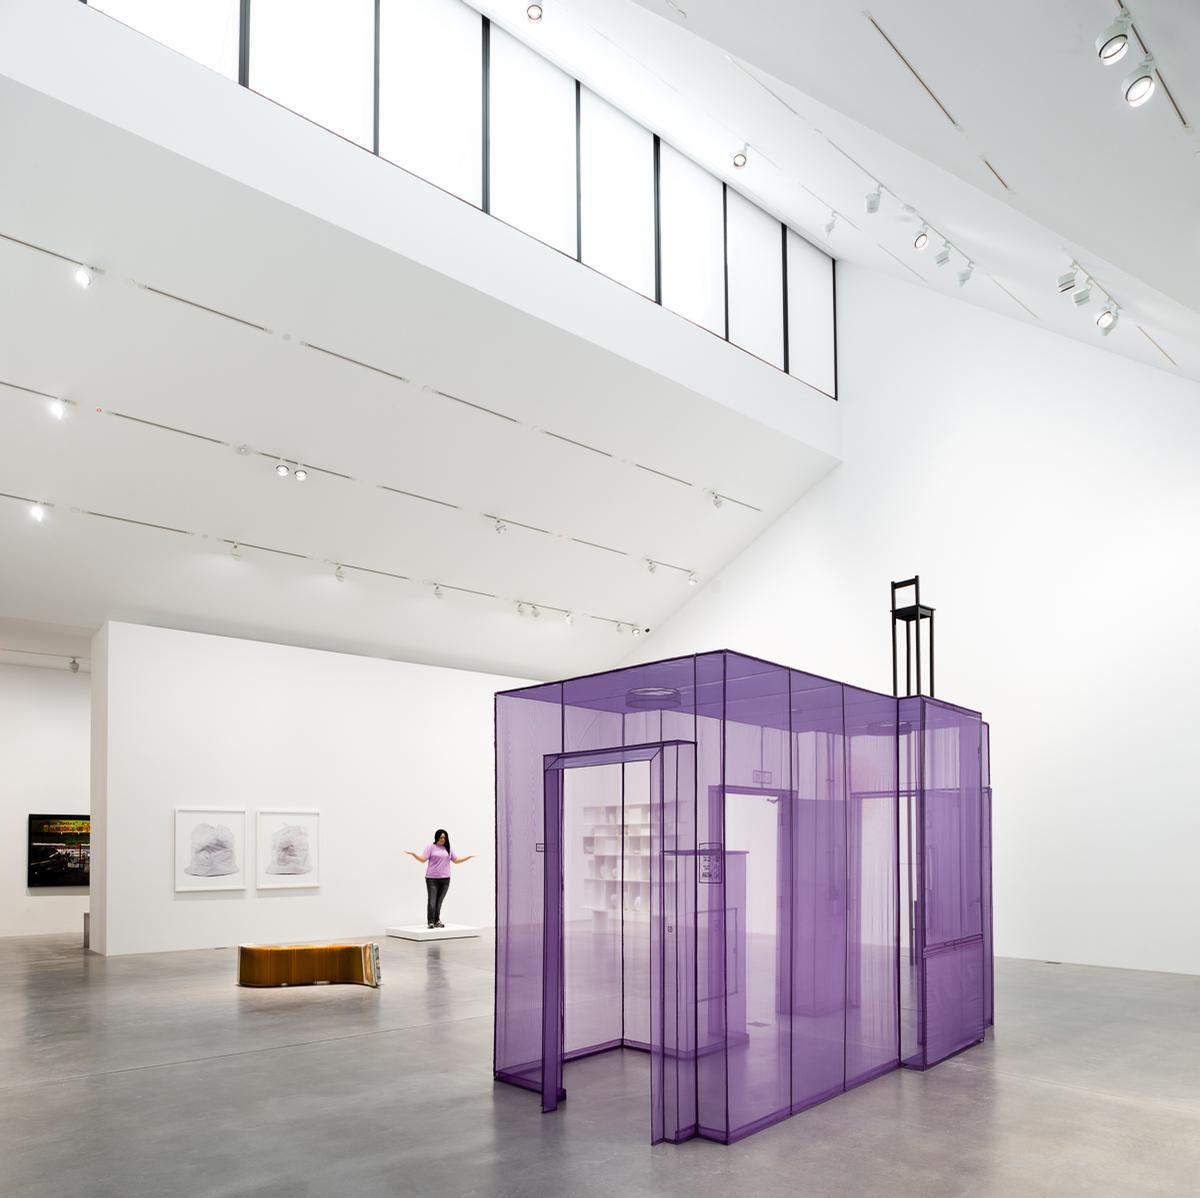 Visitors move round the gallery via an 'ambulatory loop' / Mark Menjivar